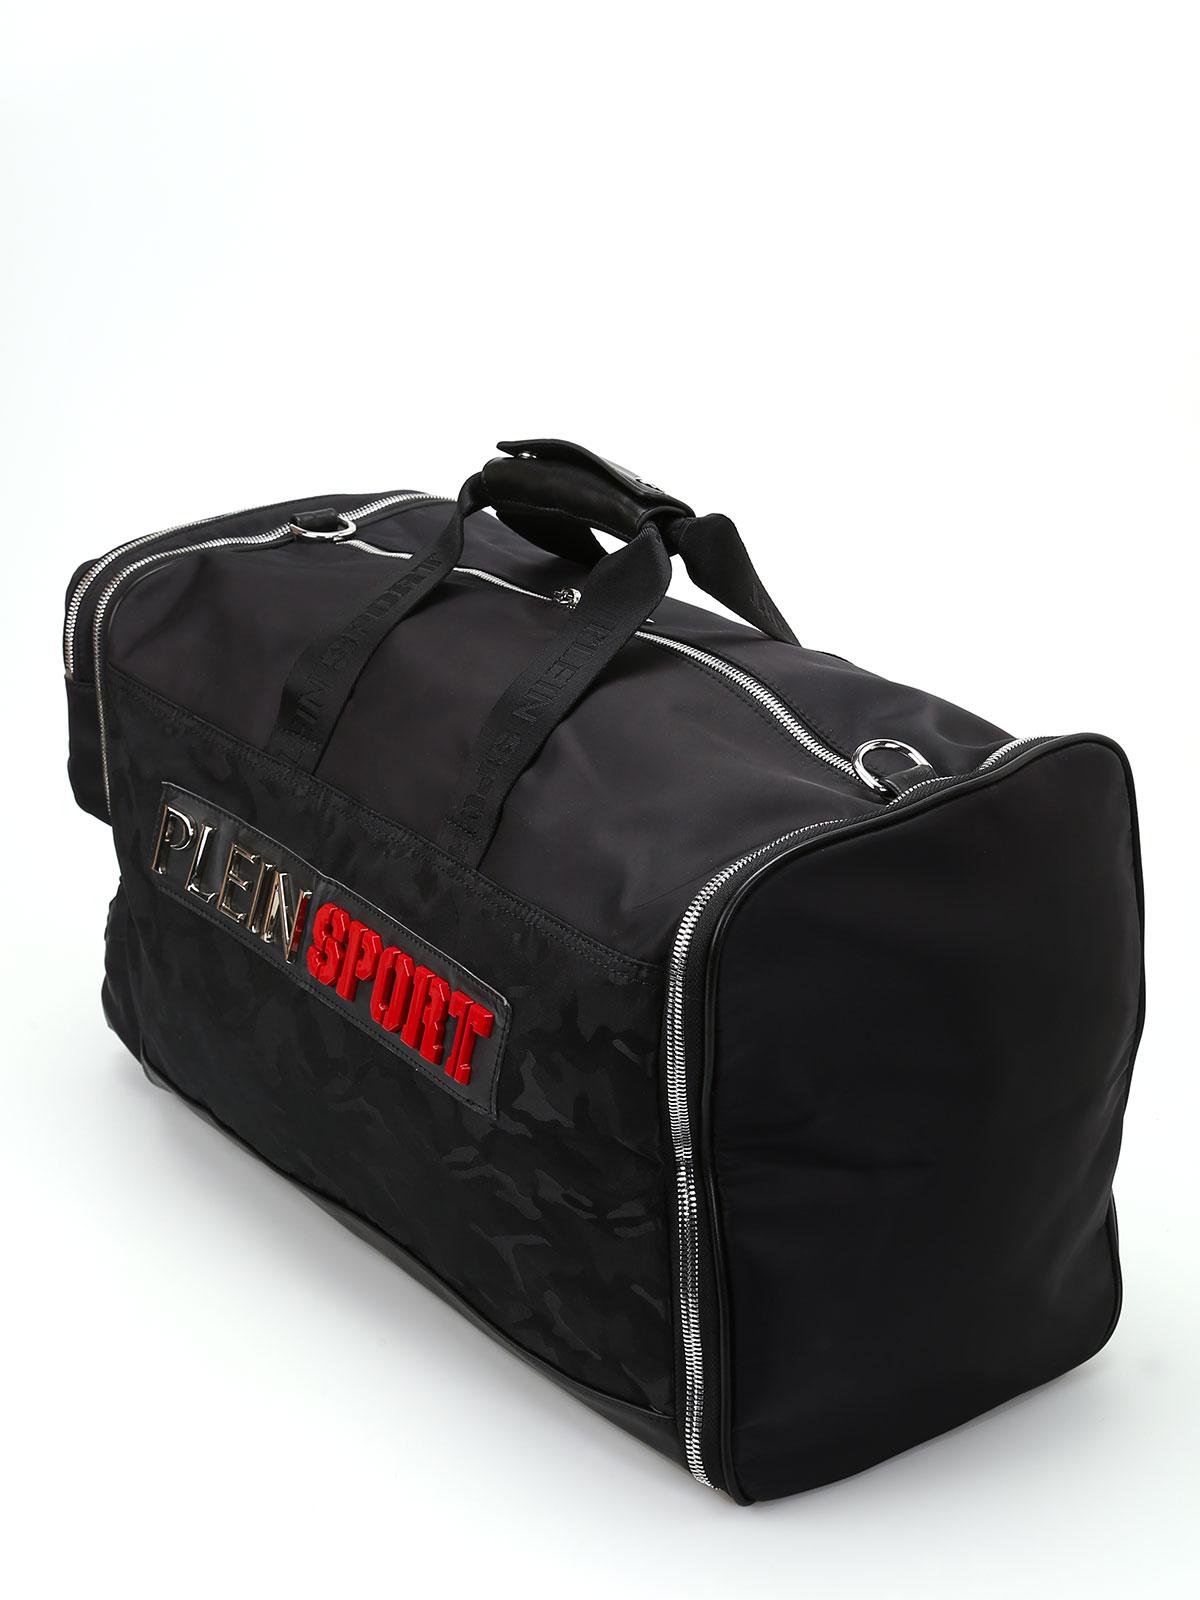 best website 483ba c8073 Plein Sport - Borsone sportivo California - borse sportive ...